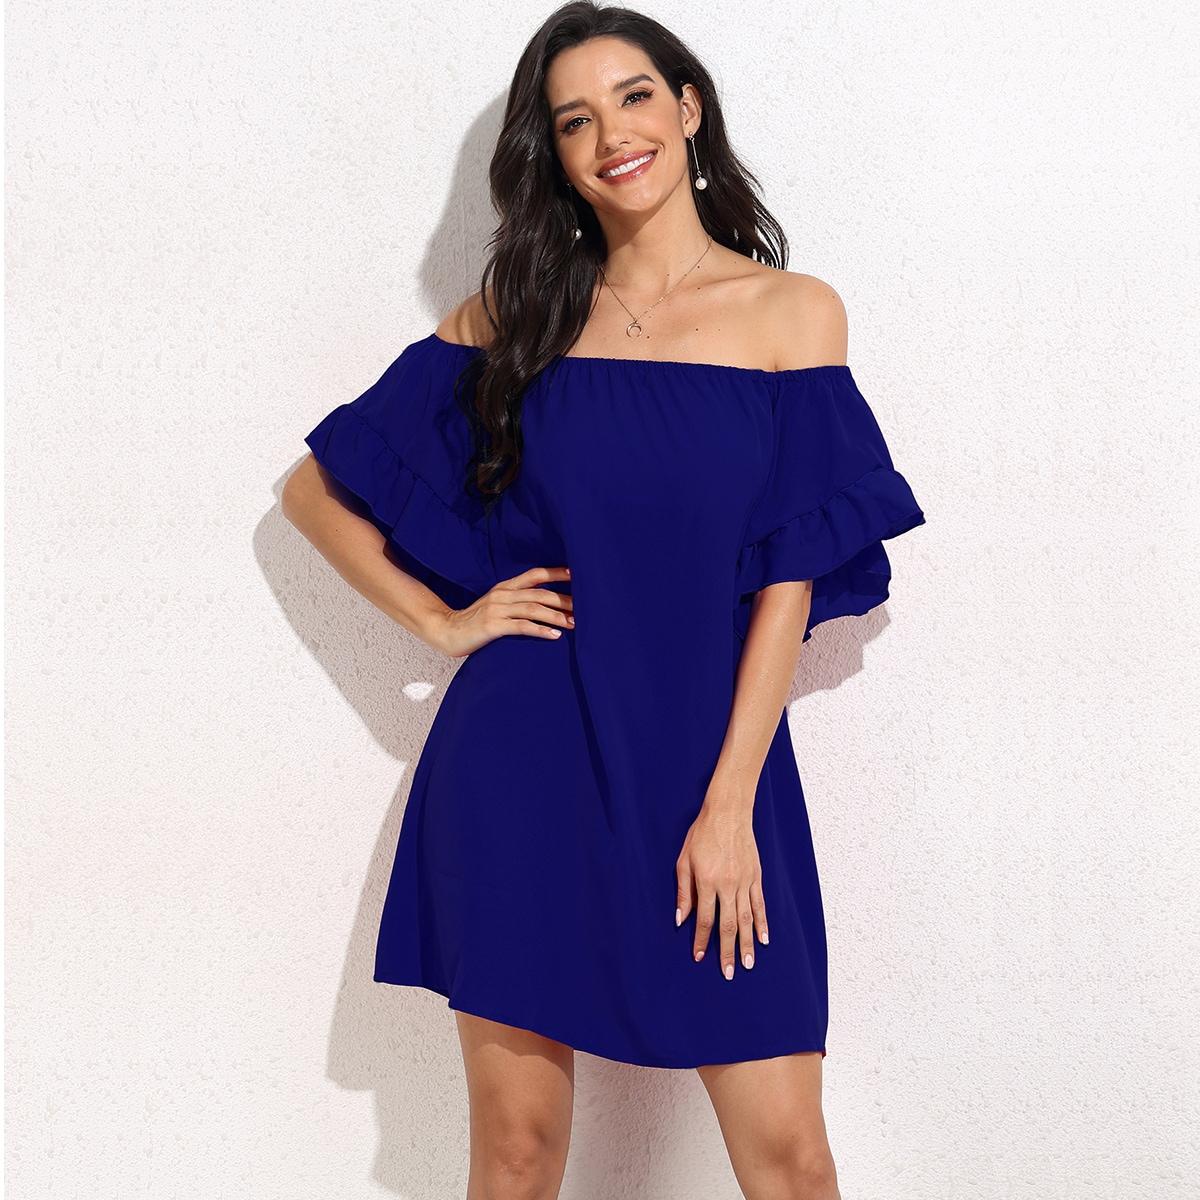 SHEIN / Solid Flounce Sleeve Bardot Dress